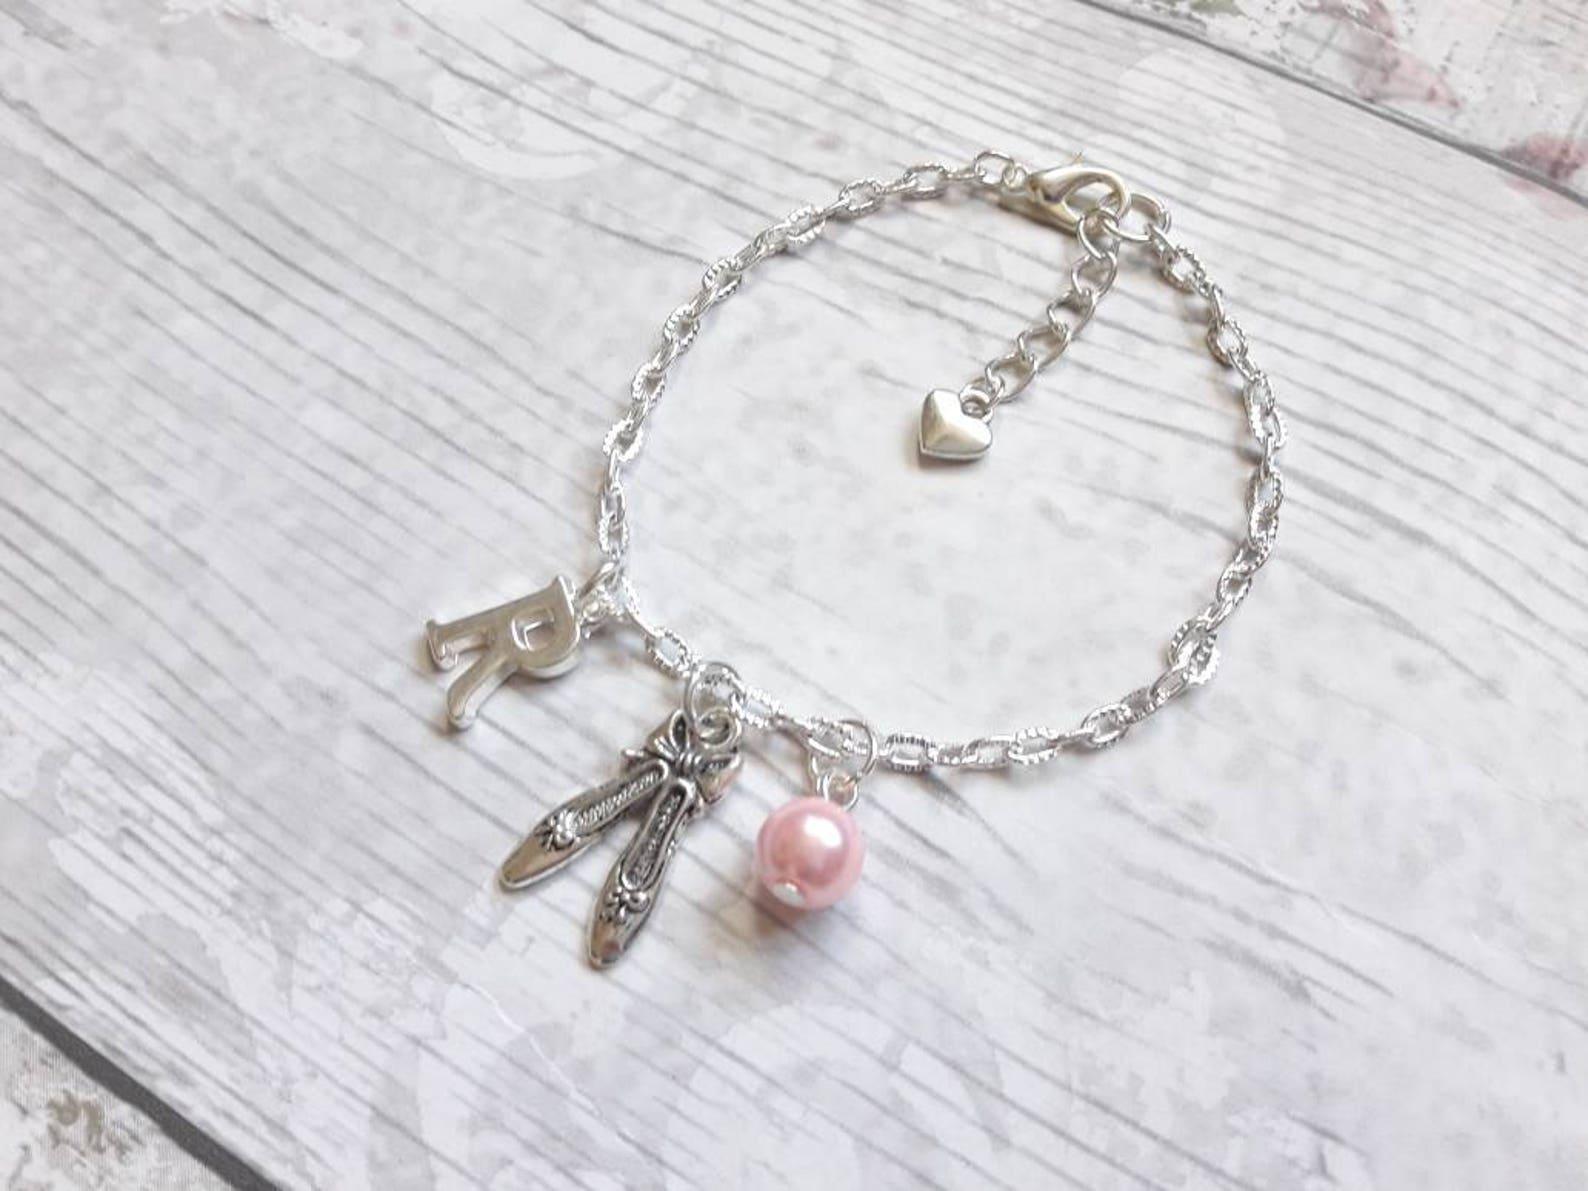 ballet shoe bracelet, ballerina slipper jewellery, dance jewelry, personalised present, initial bracelet, dancer present, gifts